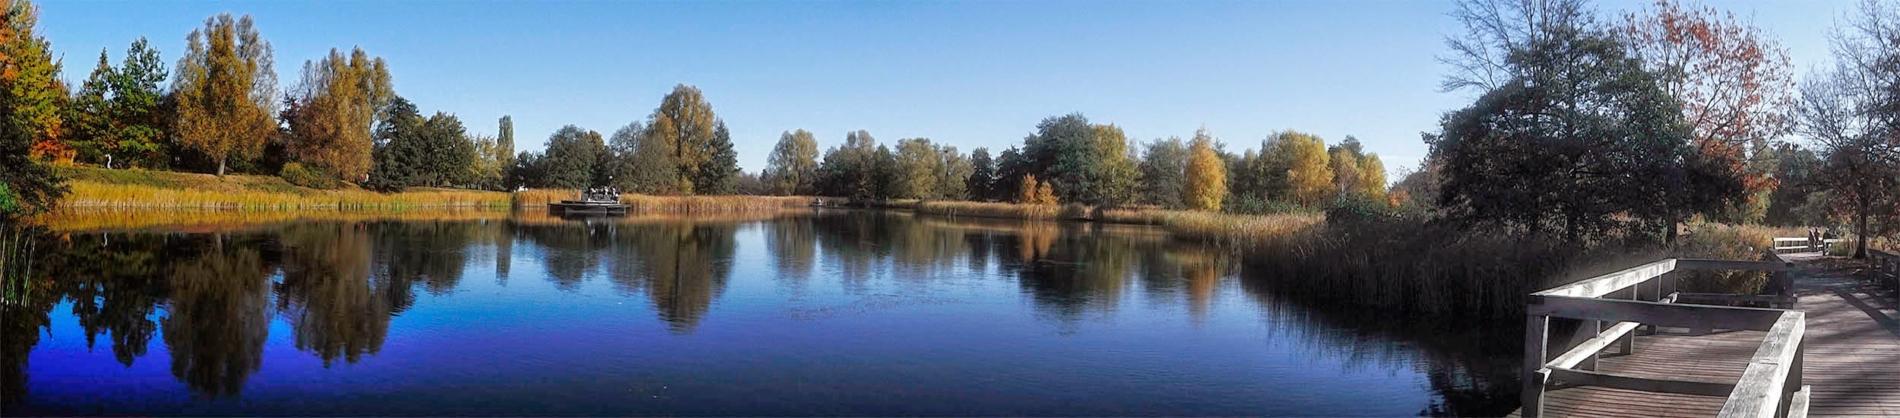 Britzer Garten Panorama 6